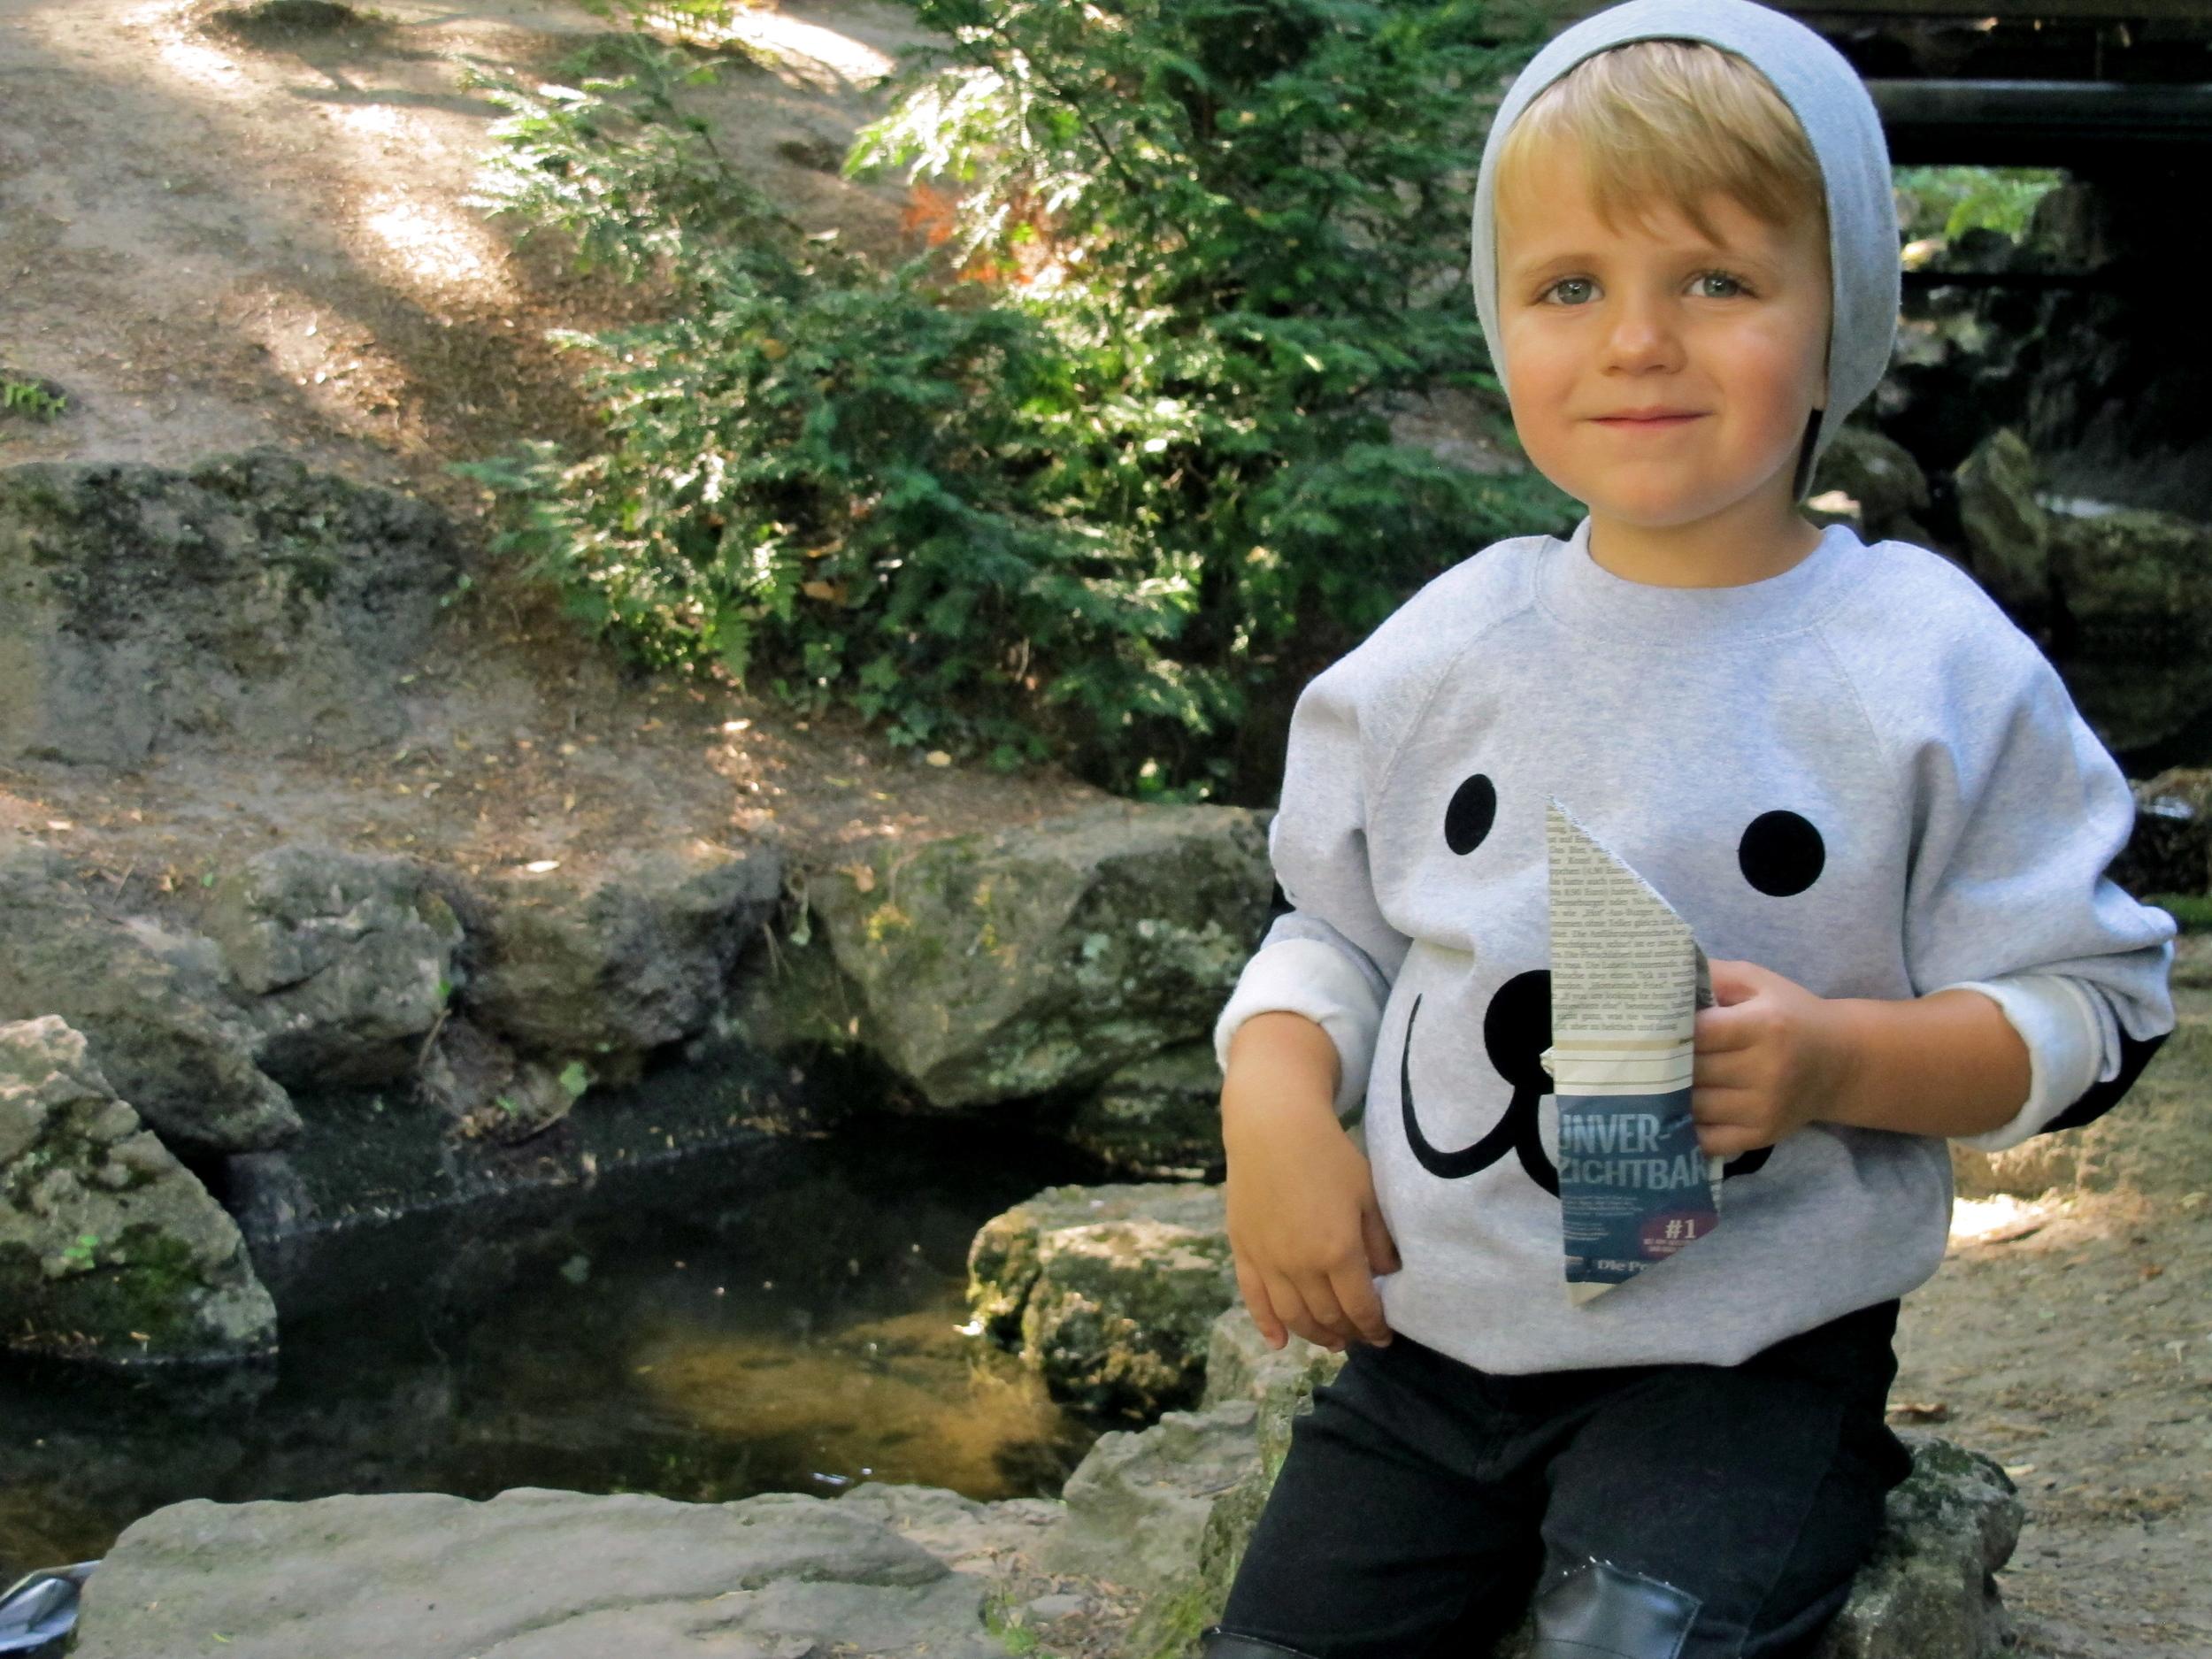 isn't he the cutest?